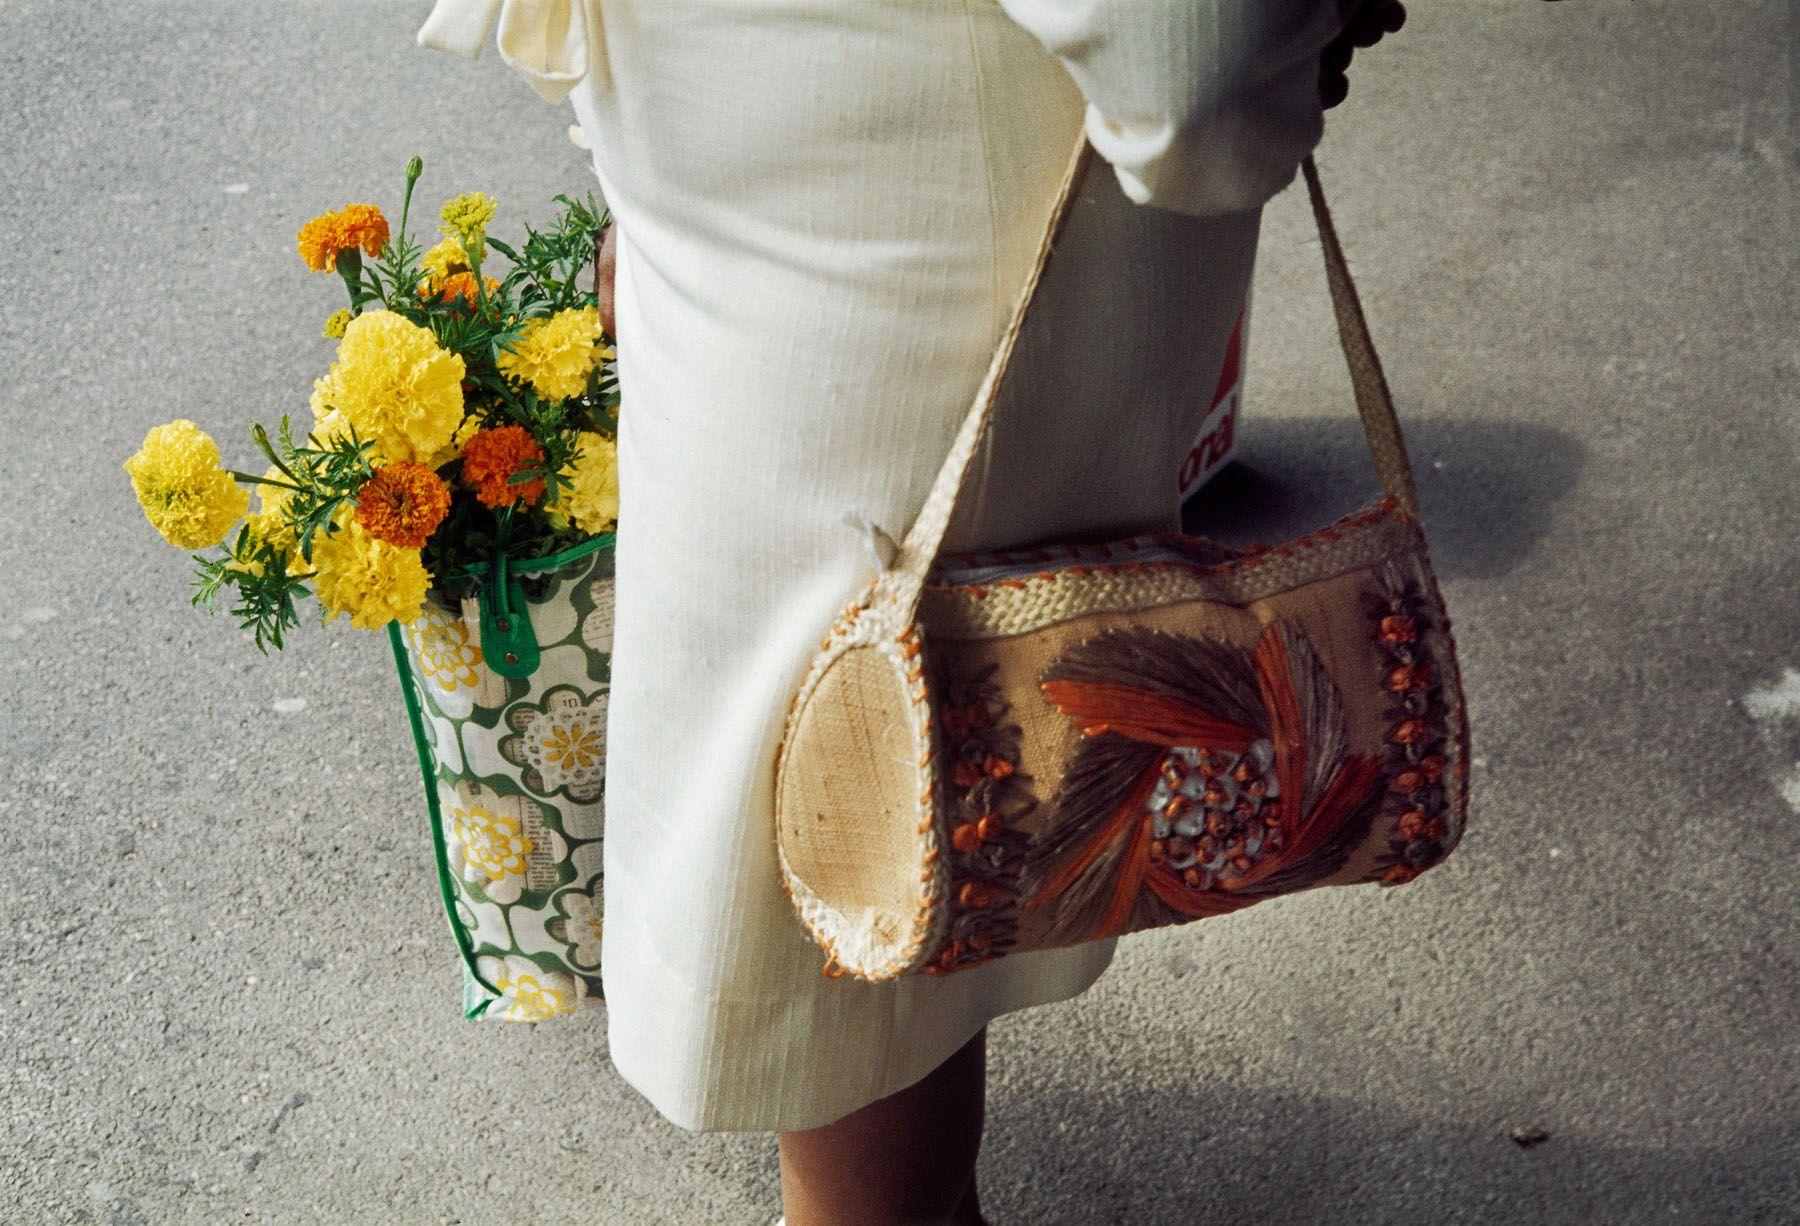 Vivian Maier - Untitled - Howard Greenberg Gallery